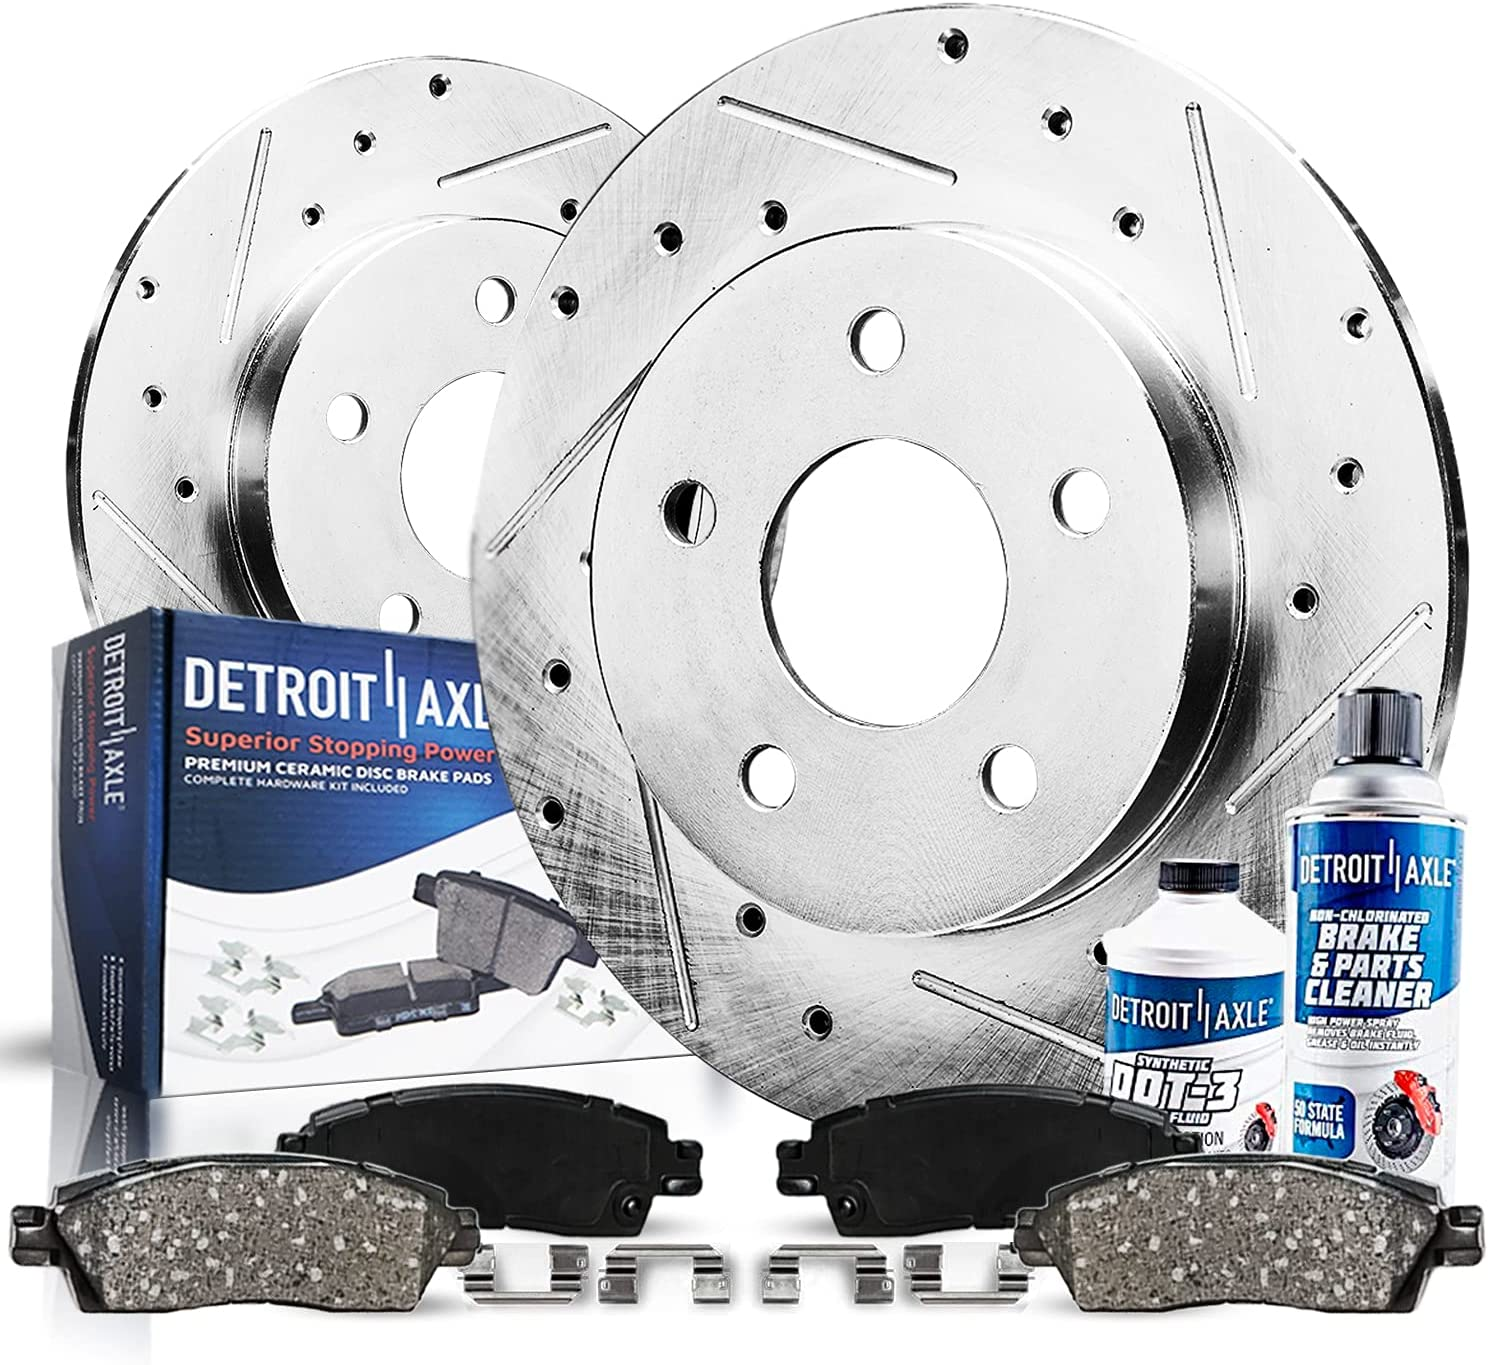 Free Shipping Cheap Bargain Gift Detroit Axle - Rear Drilled and Washington Mall Kit Ceram w Rotors Slotted Brake